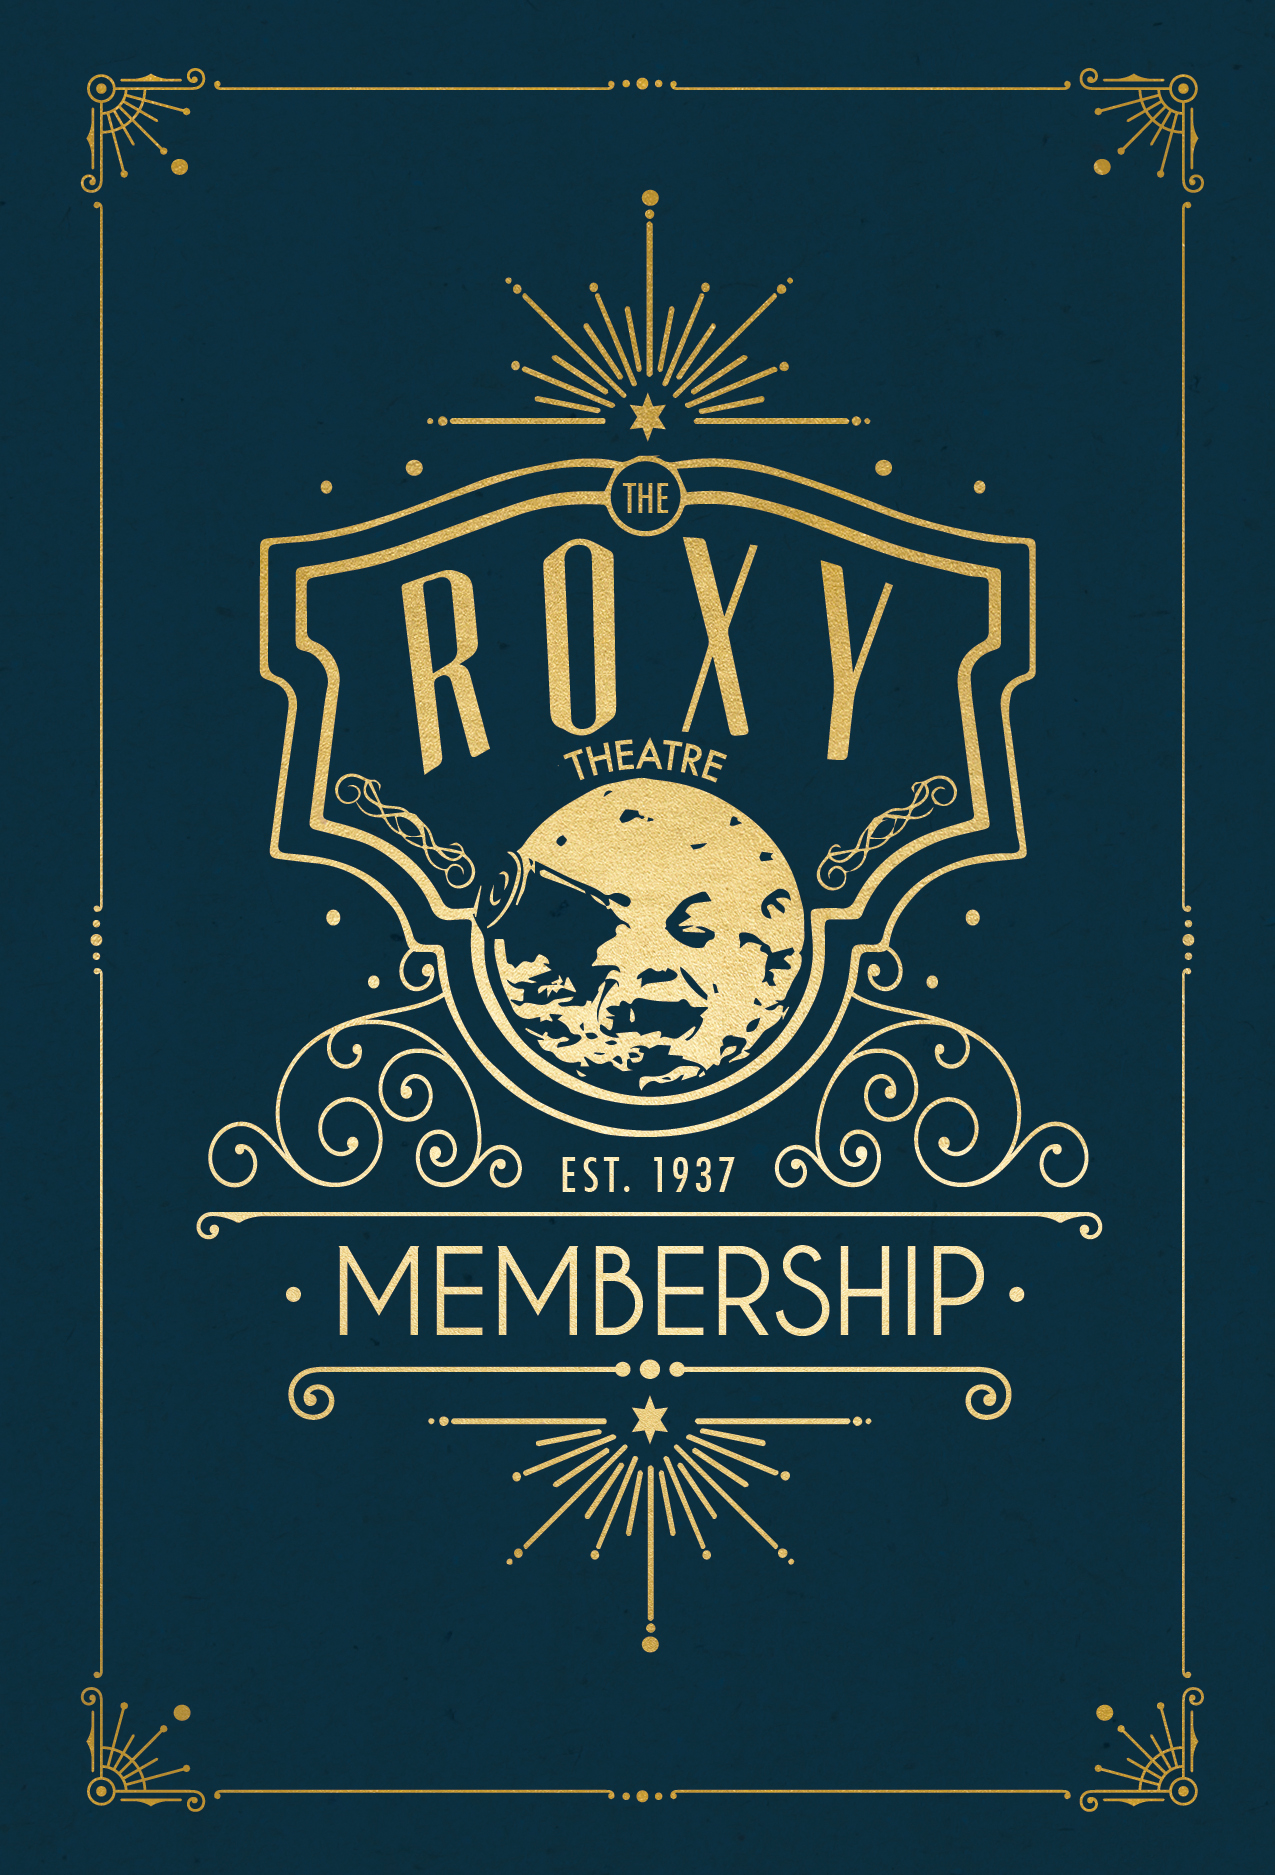 Roxy Theatre Membership Branding